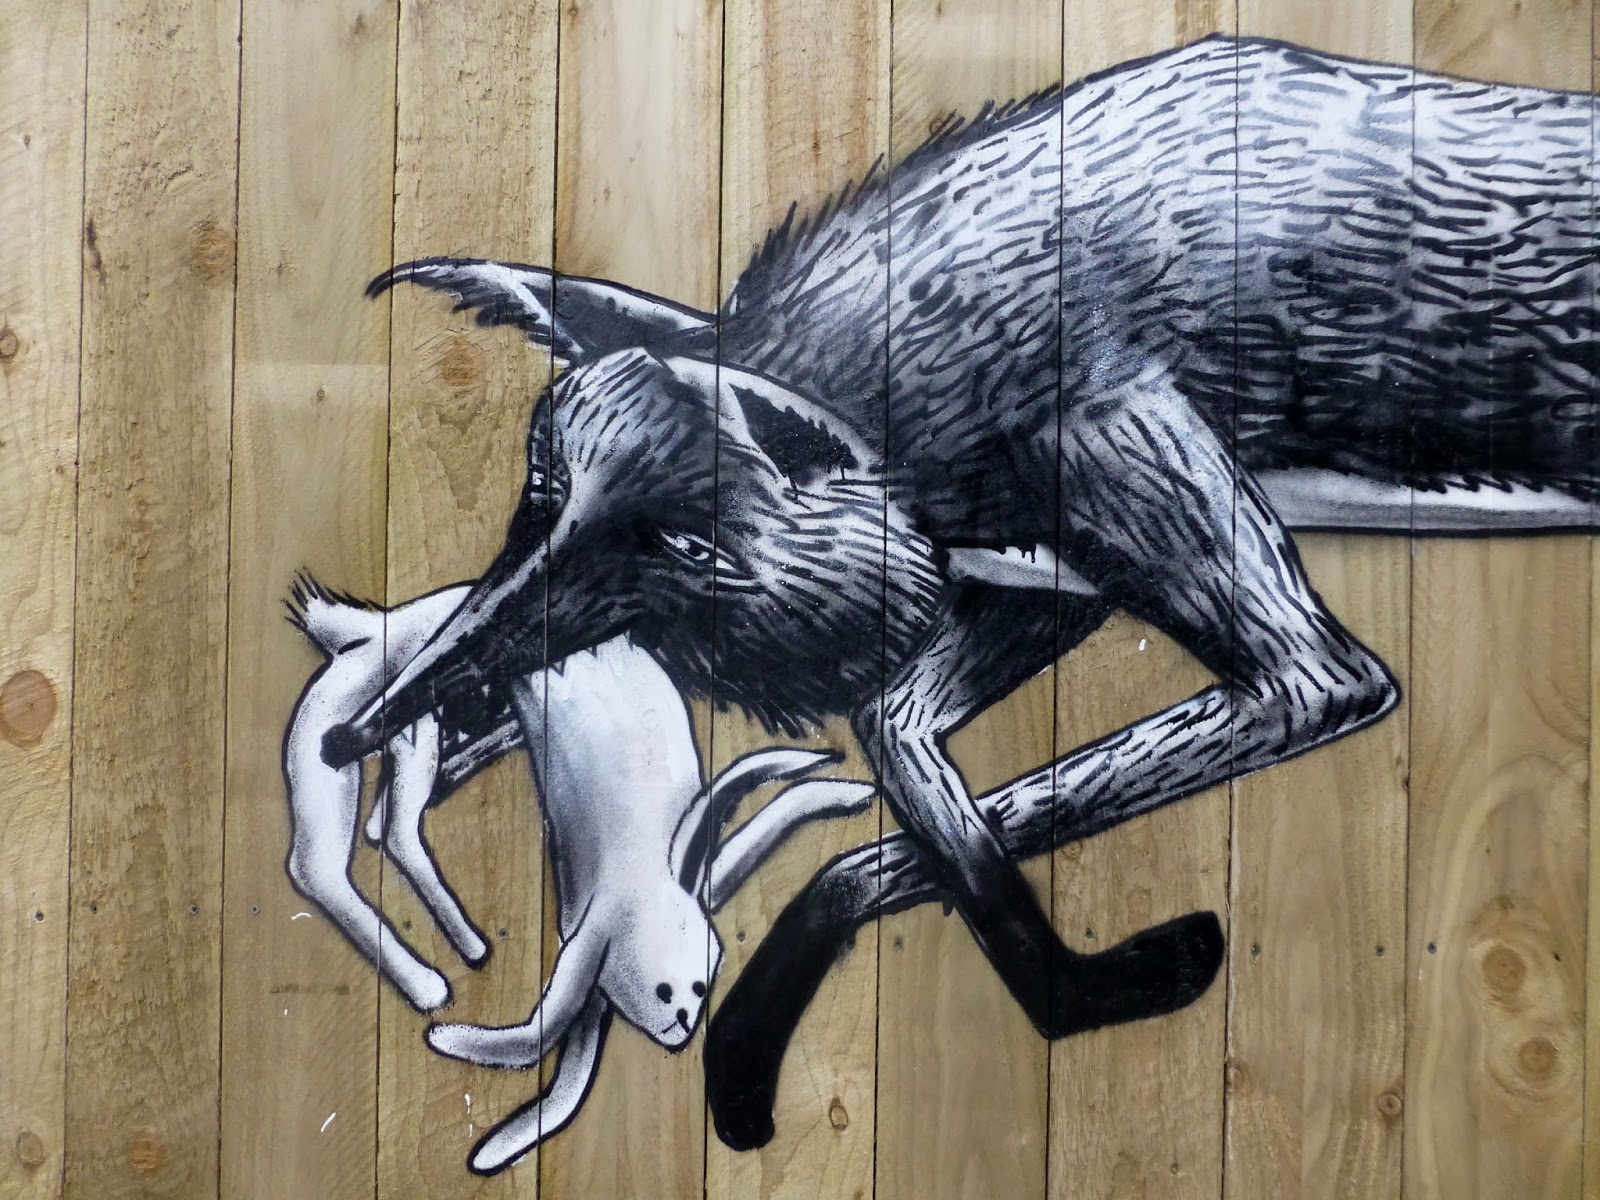 phlegm-urban-foxes-new-mural-sheffield-03